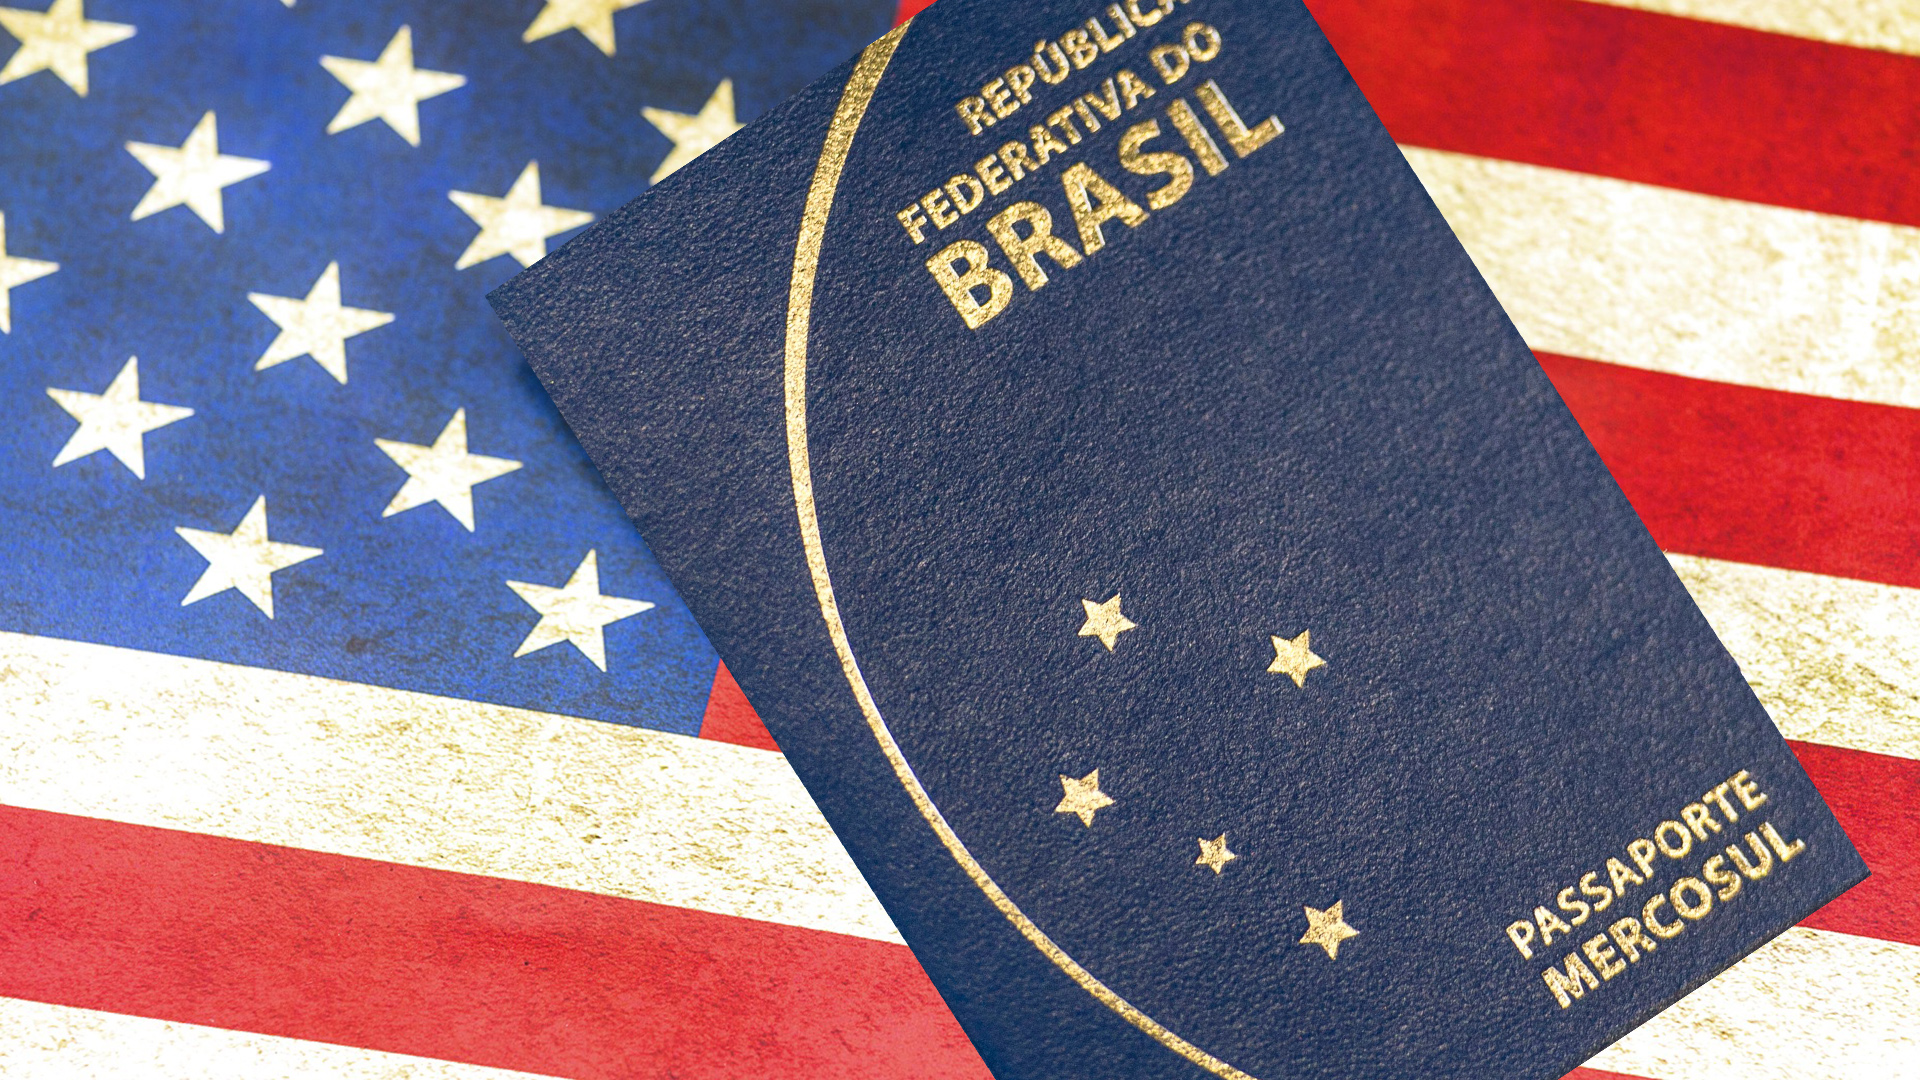 documentos-para-visto-americano-1  Visto Americano